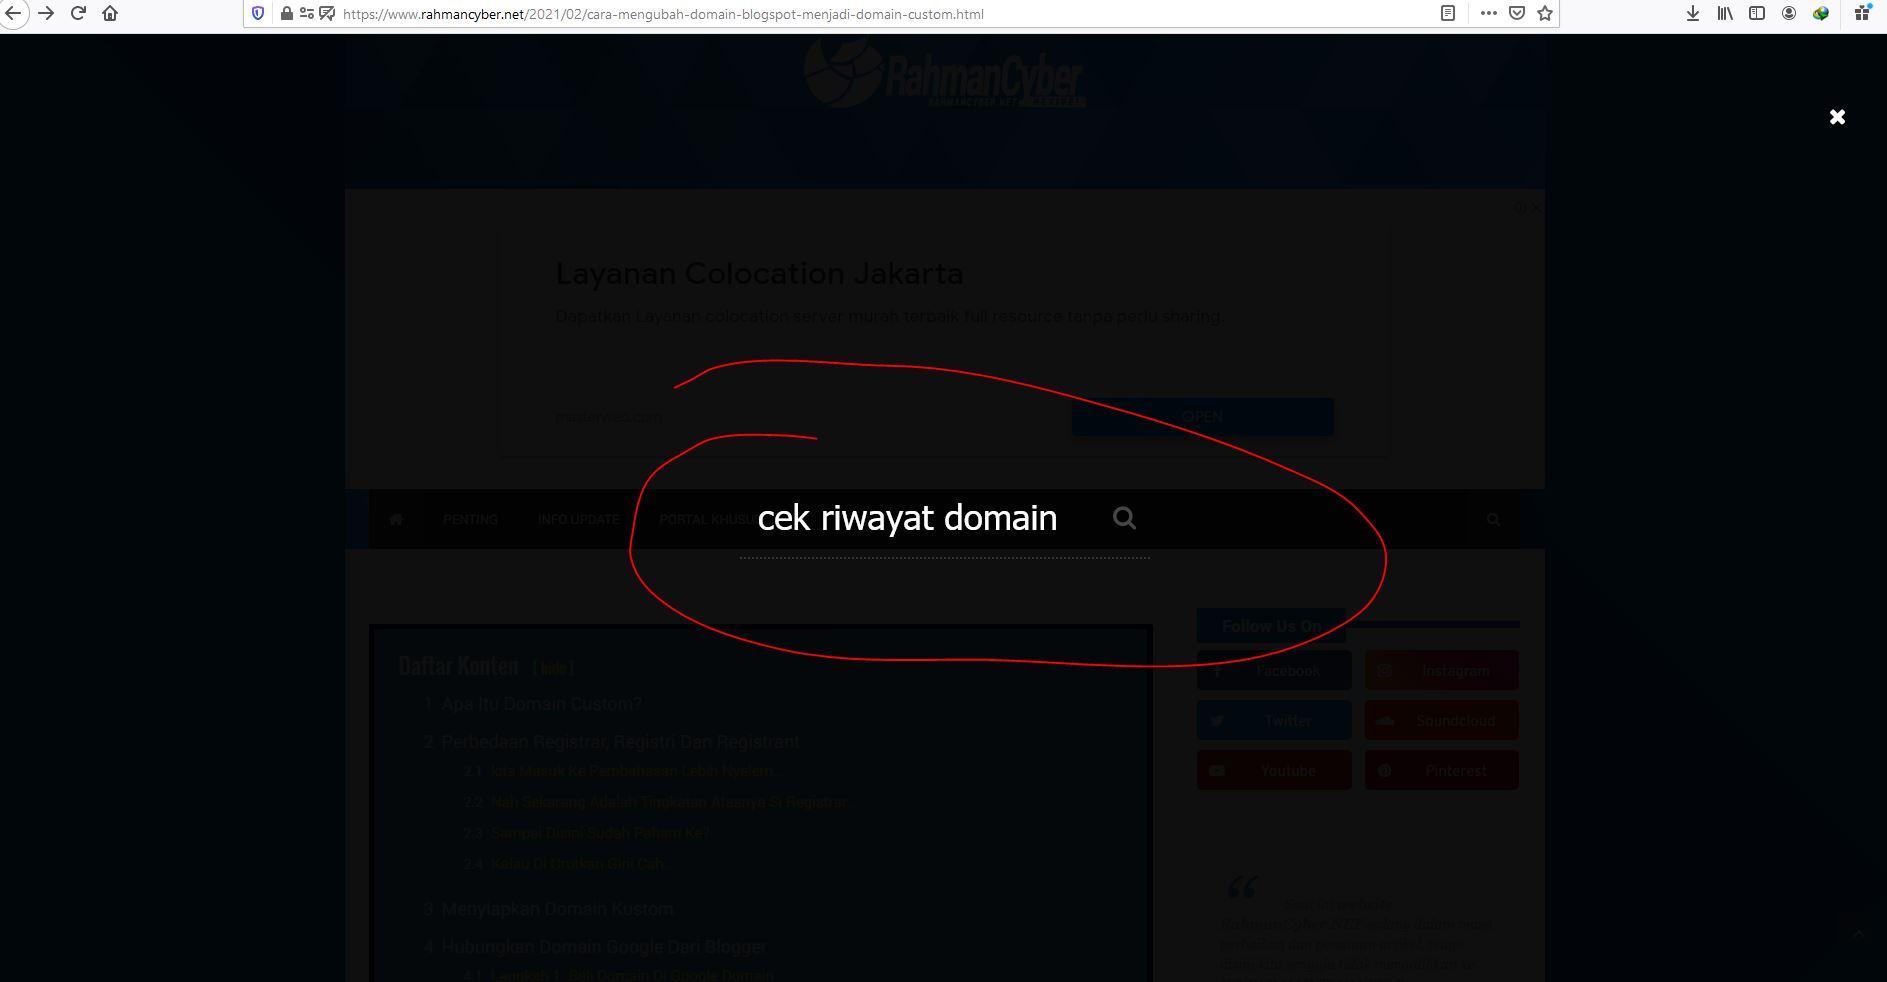 Search RahmanCyber